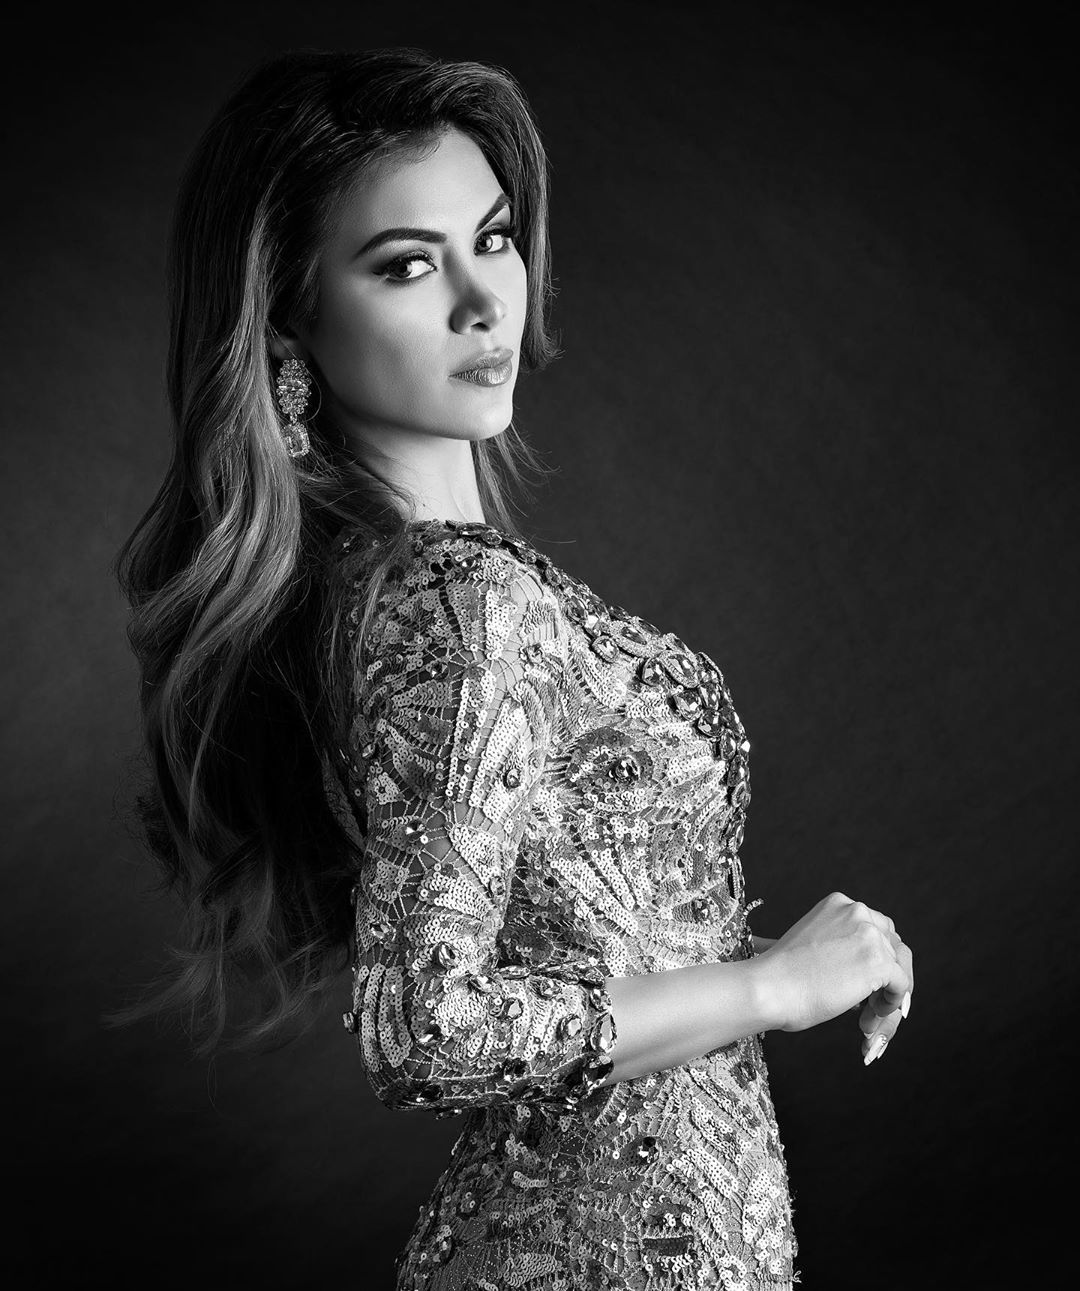 pierina melendez, miss hispanoamericana peru 2019. 72917010